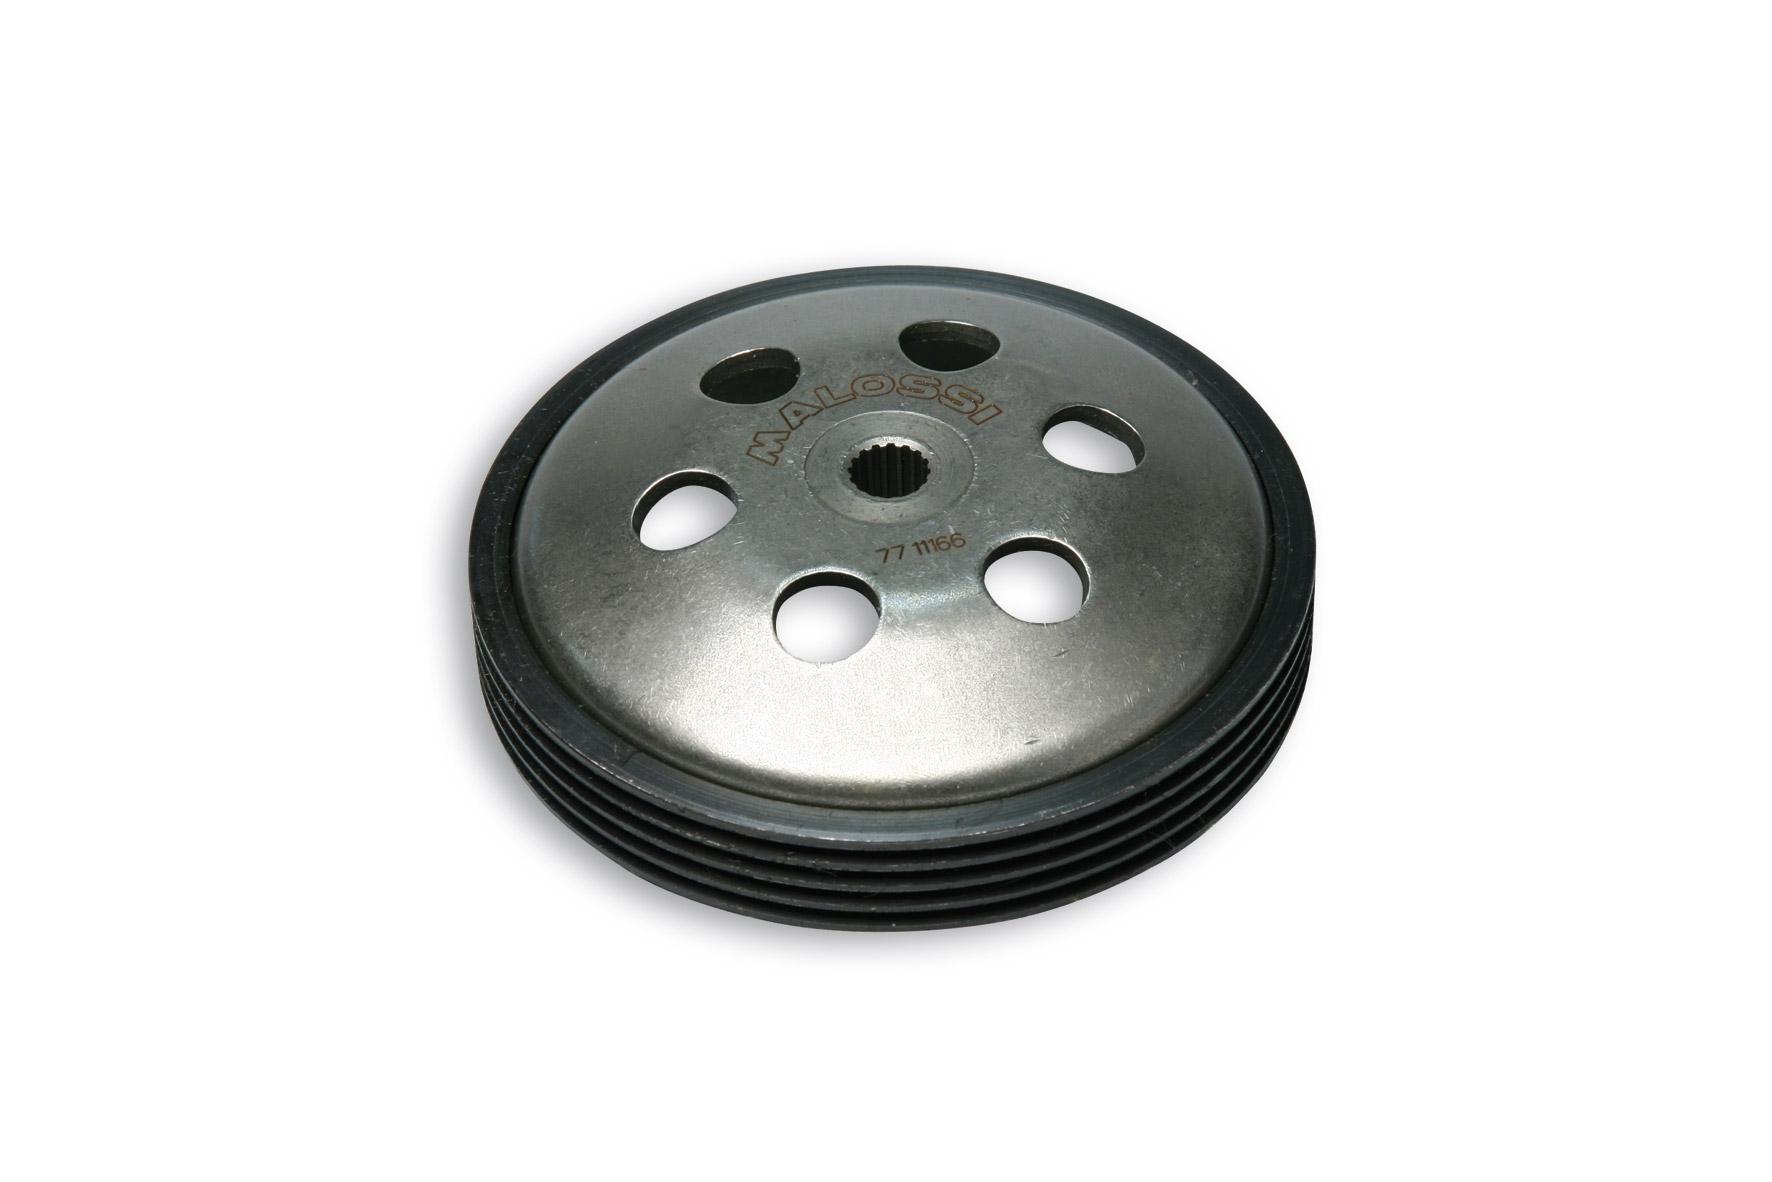 Campana frizione alettata WING CLUTCH BELL Ø interno 107 mm e peso 579 grammi per motori Yamaha - Minarelli